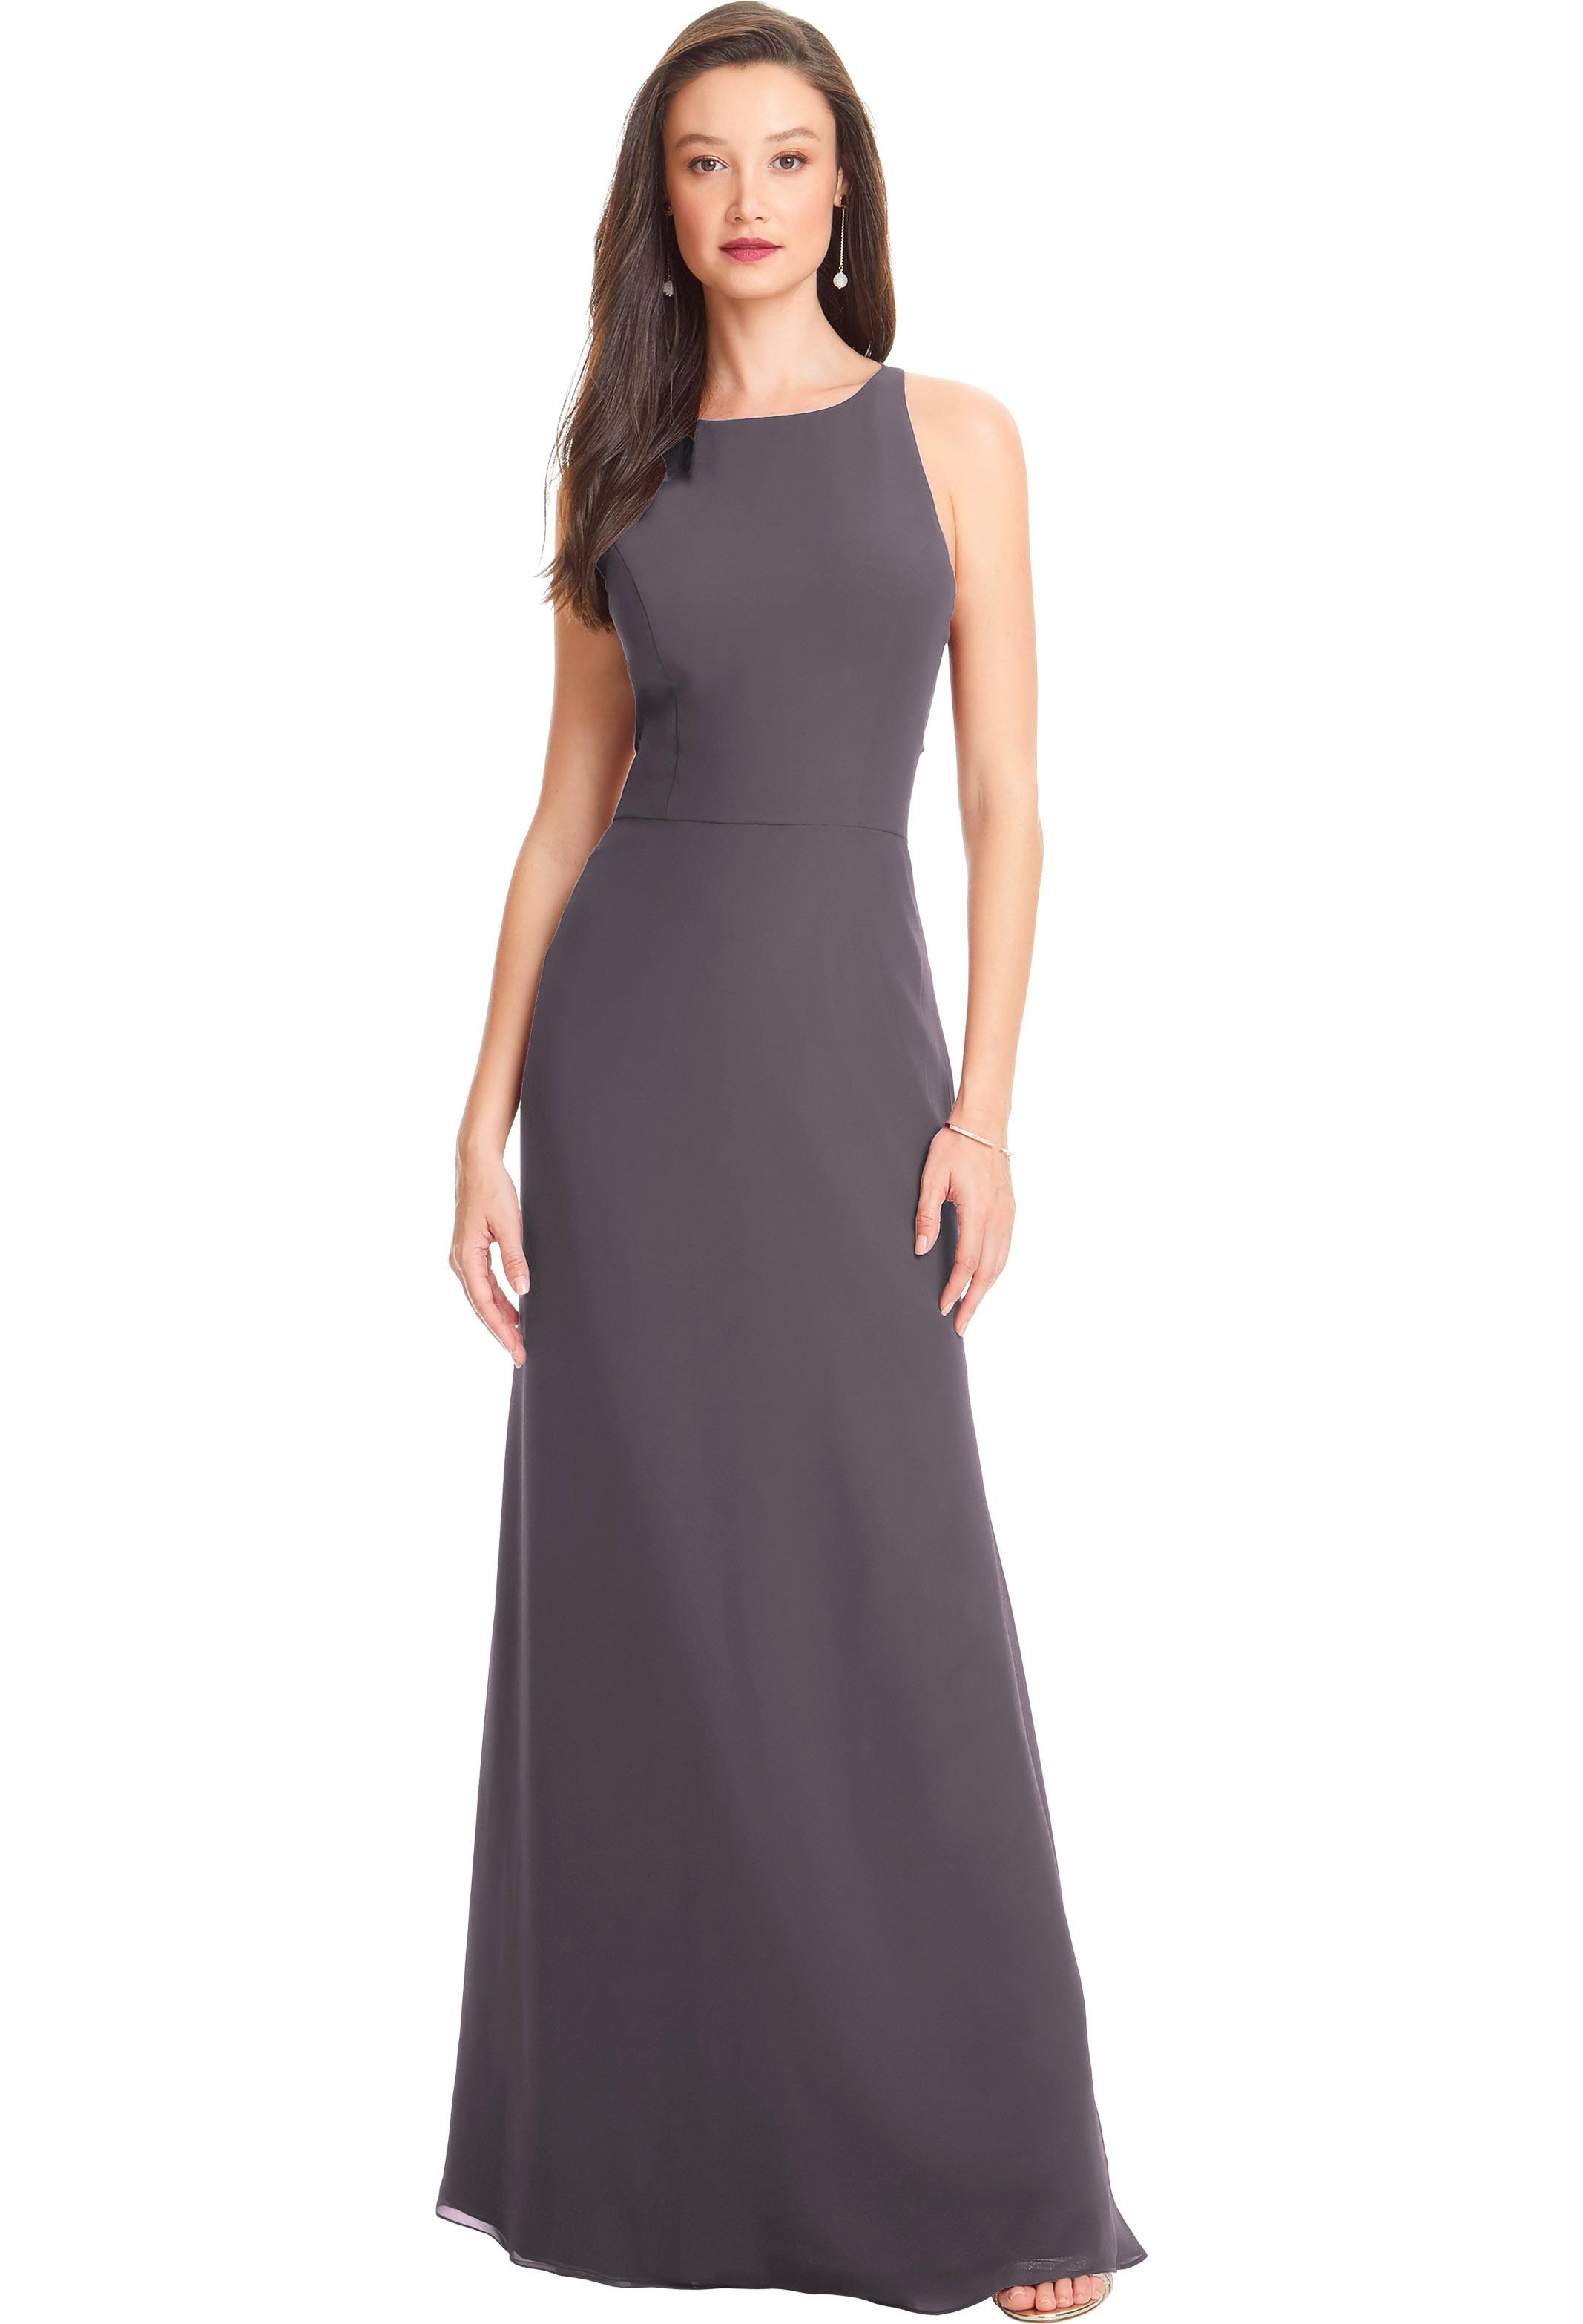 Bill Levkoff HEATHER Chiffon Sleeveless A-line gown, $210.00 Front